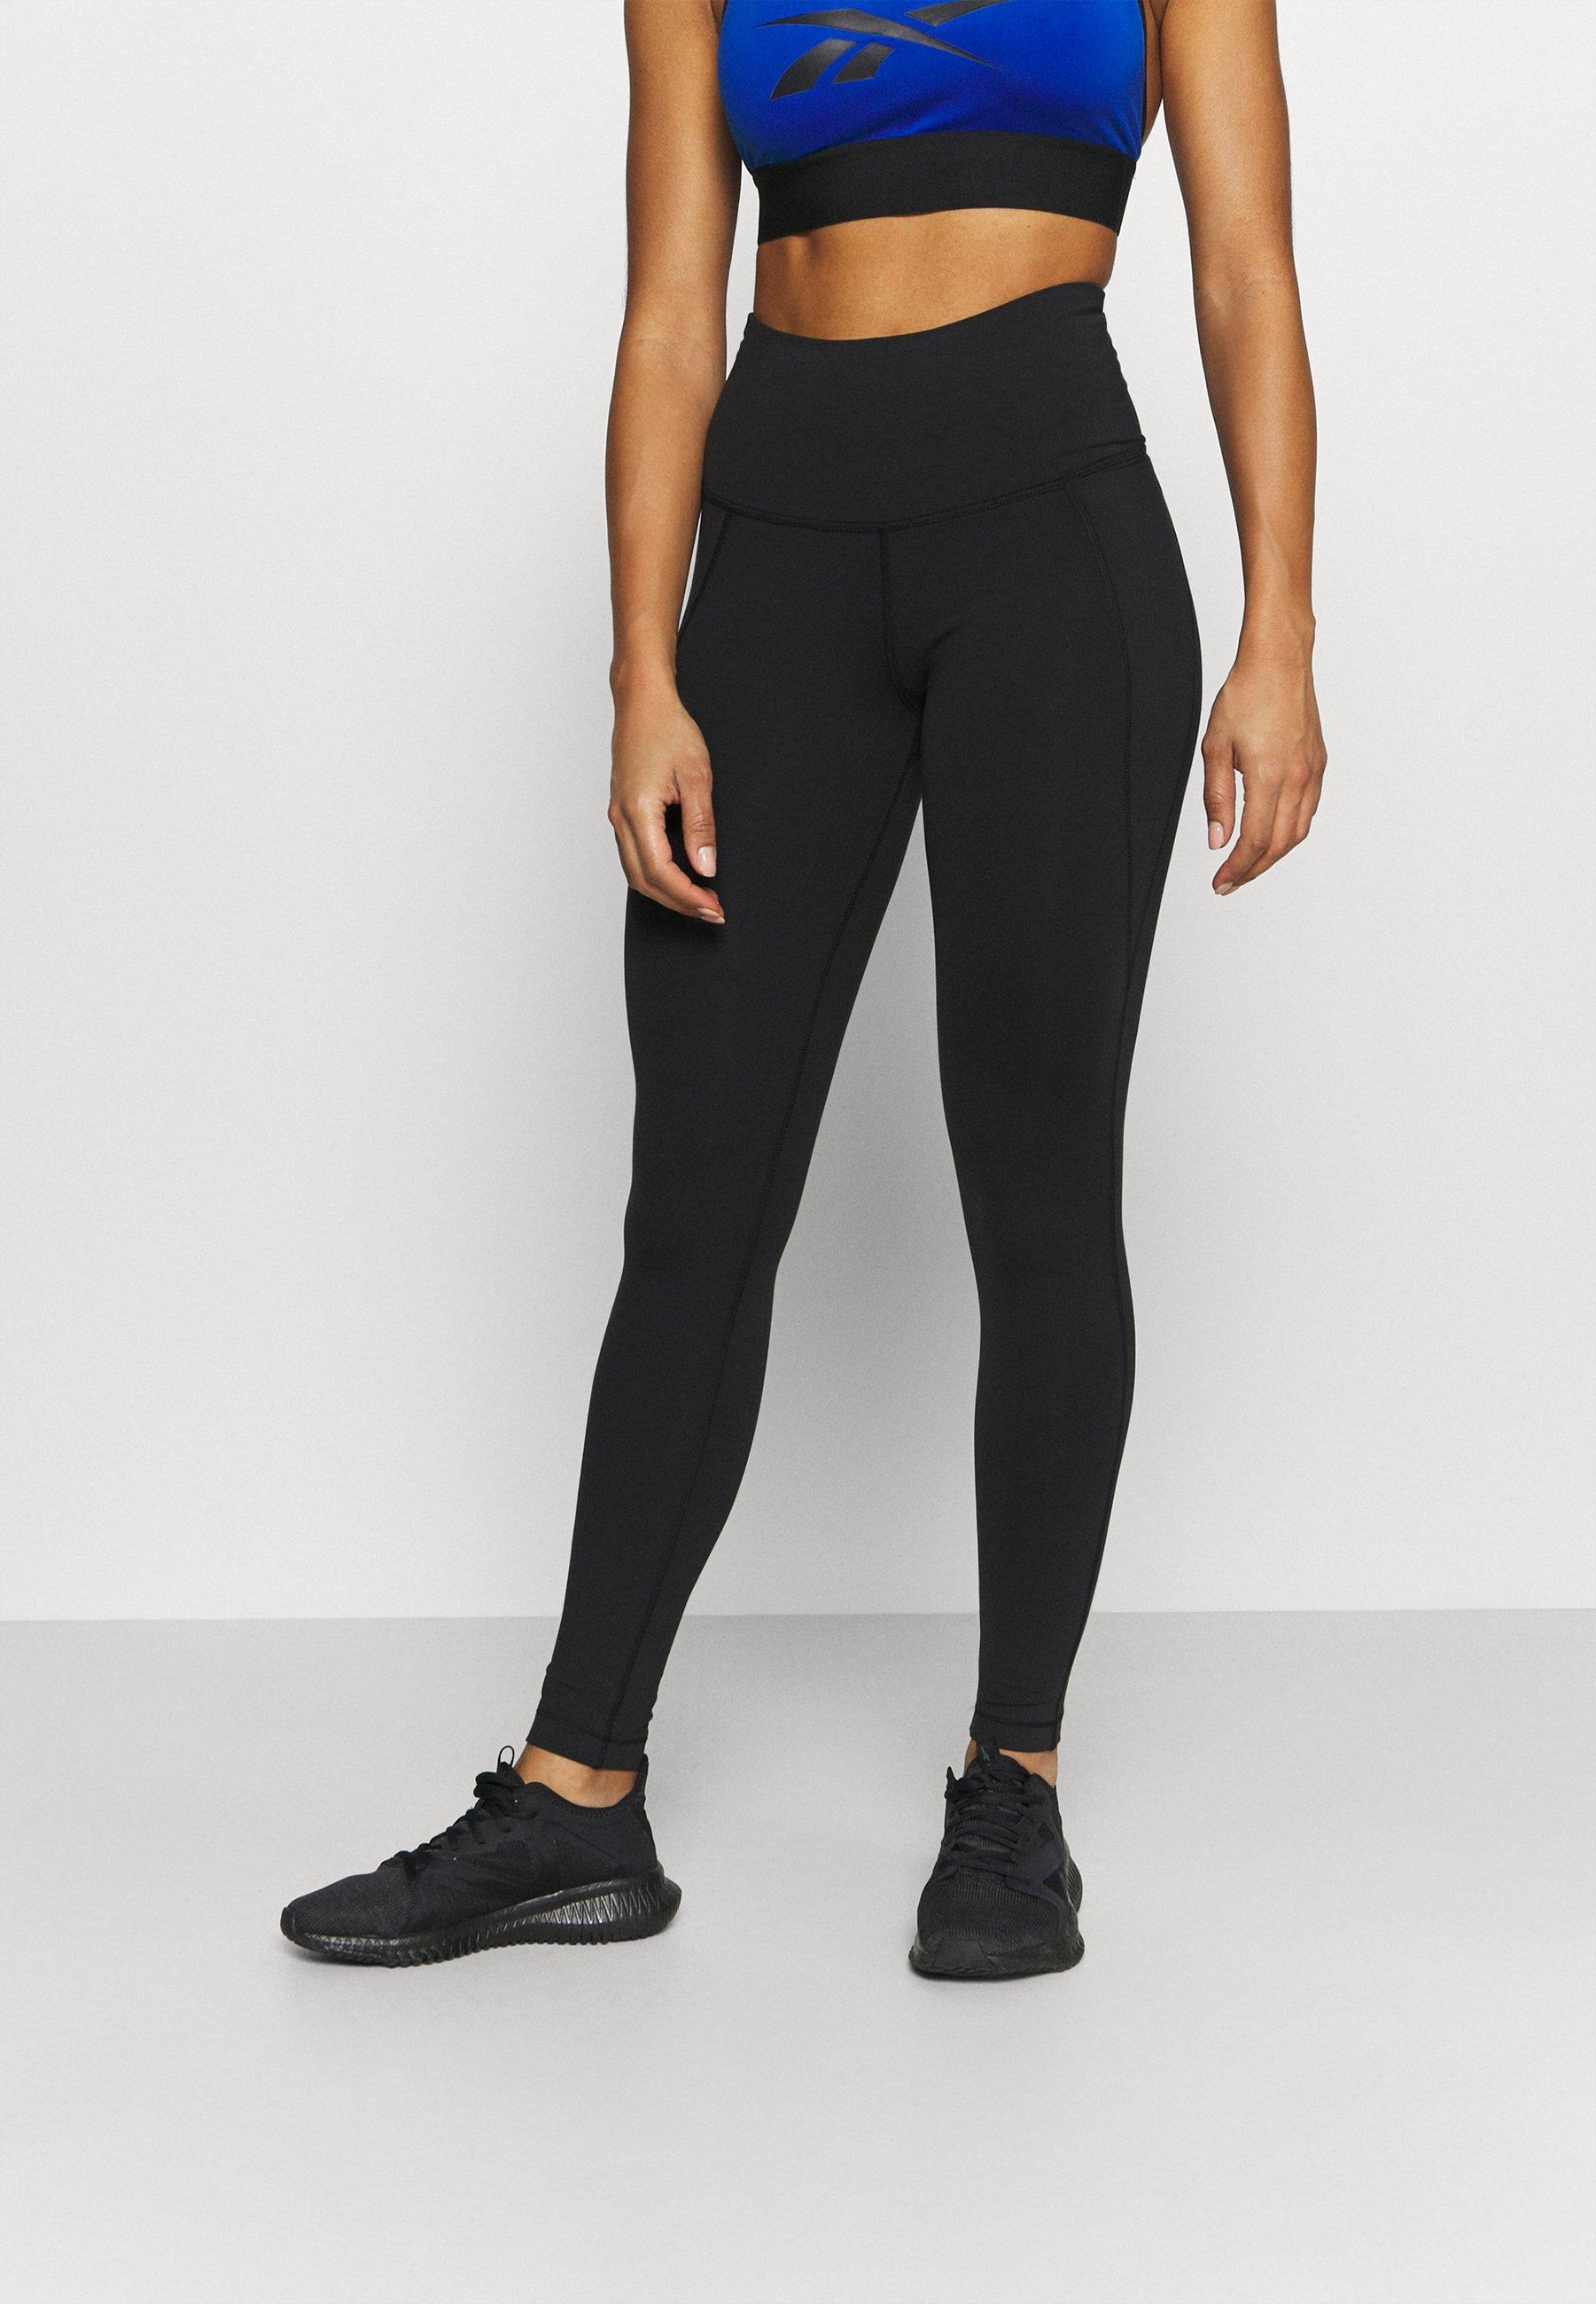 Femme LUX HIGHRISE - Collants